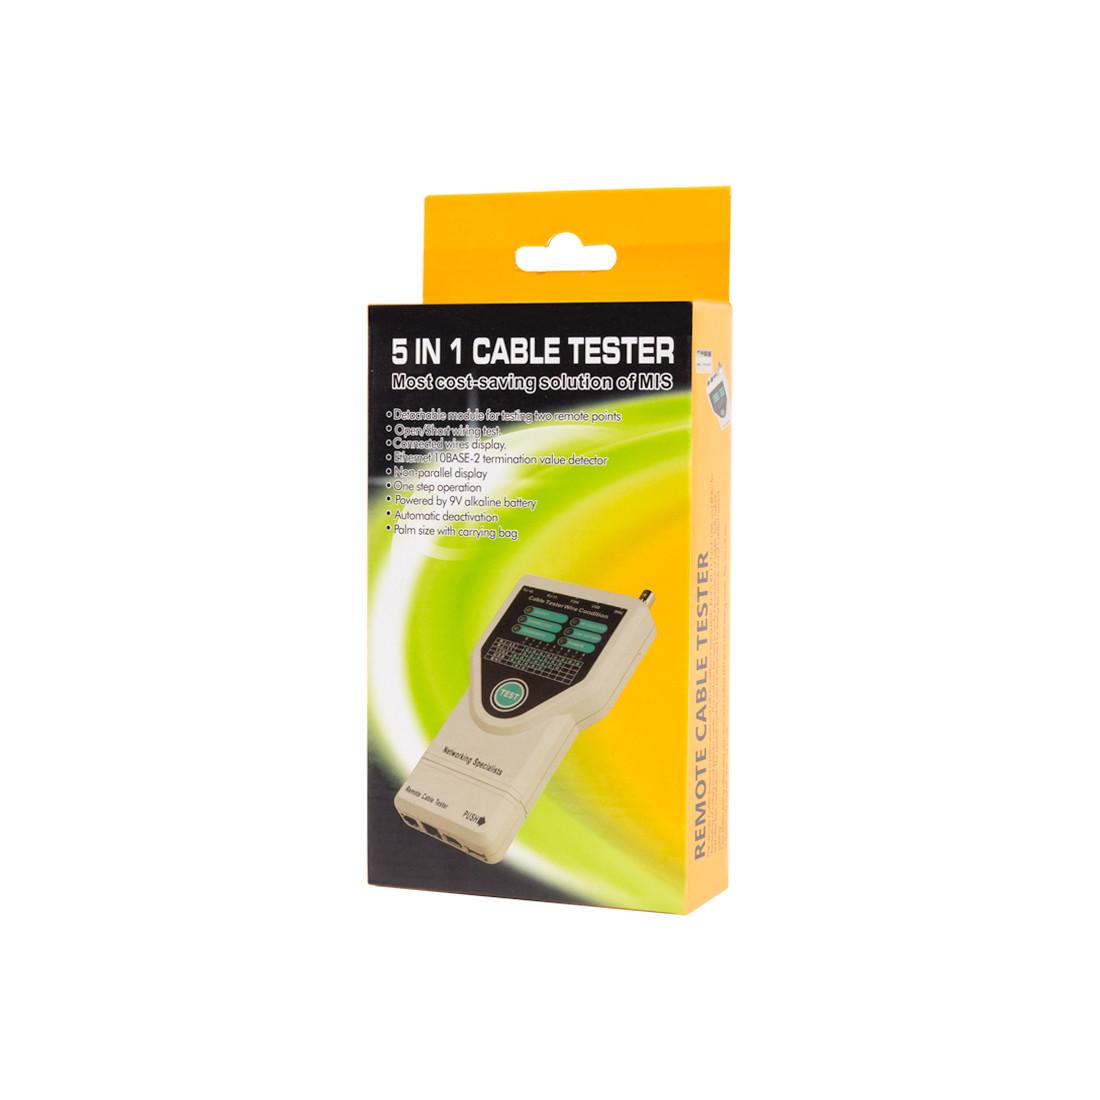 SHIP G278 Кабельный тестер Для тестирования BNC, RJ-45, RJ-11, USB, IEE 1394 Fire Wire